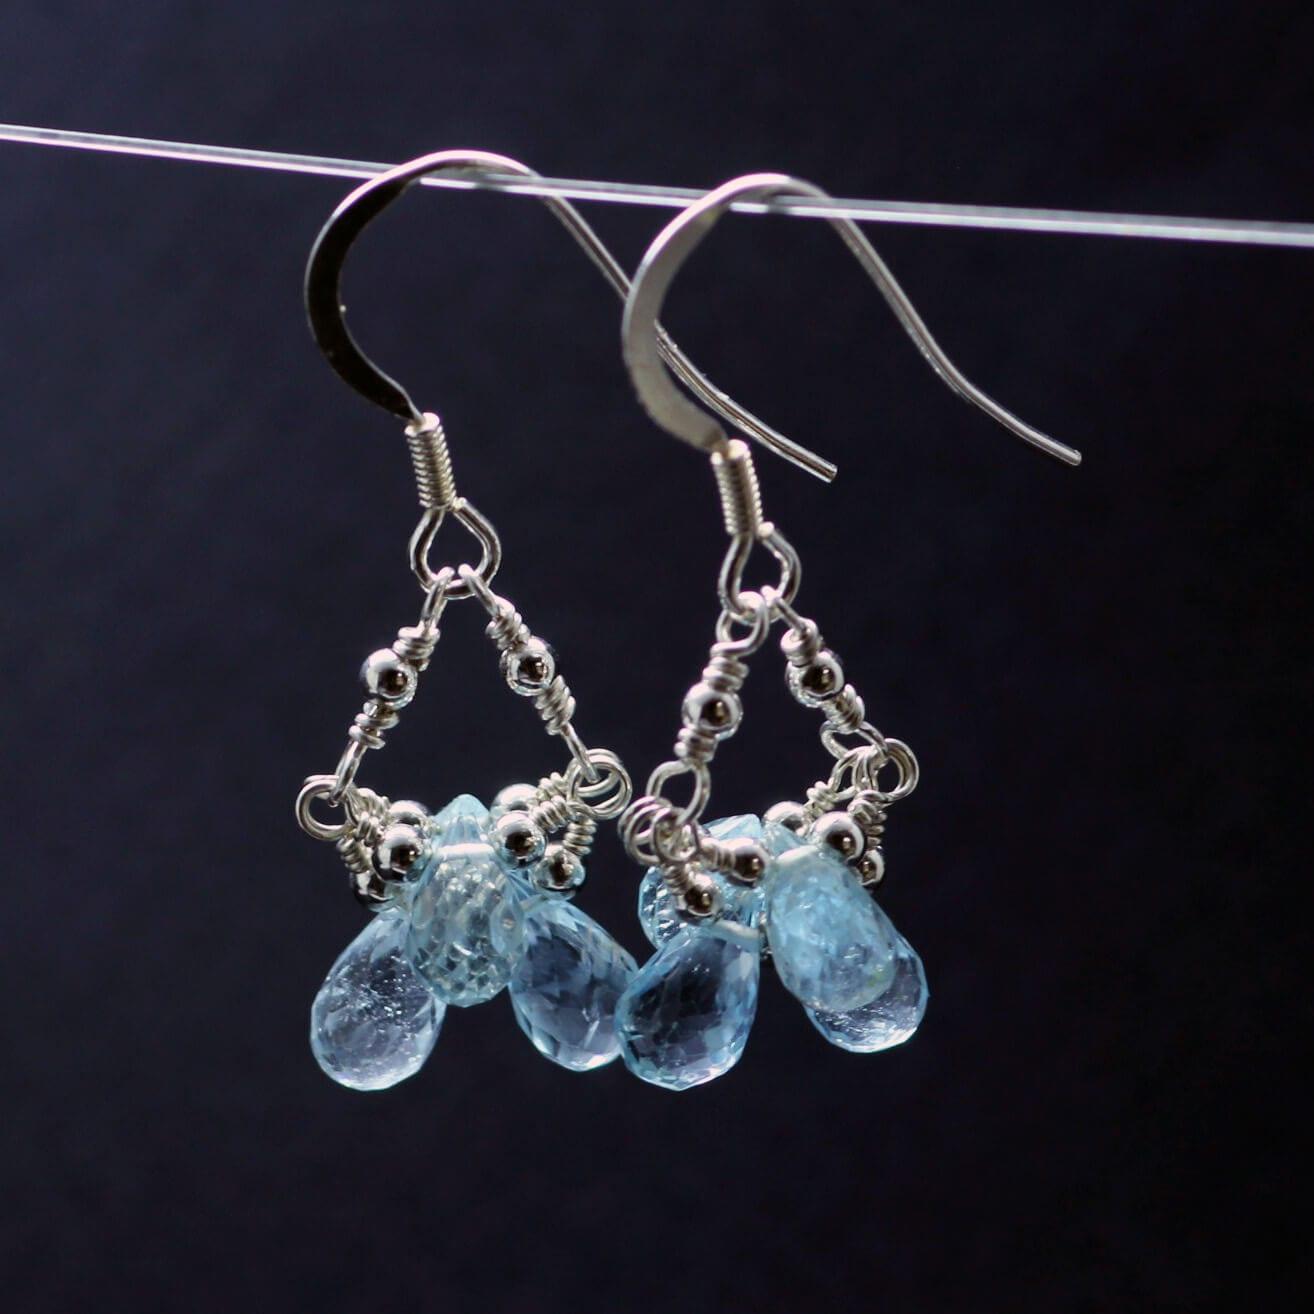 Sterling Silver sky blue Topaz briolette dangle earrings handmade